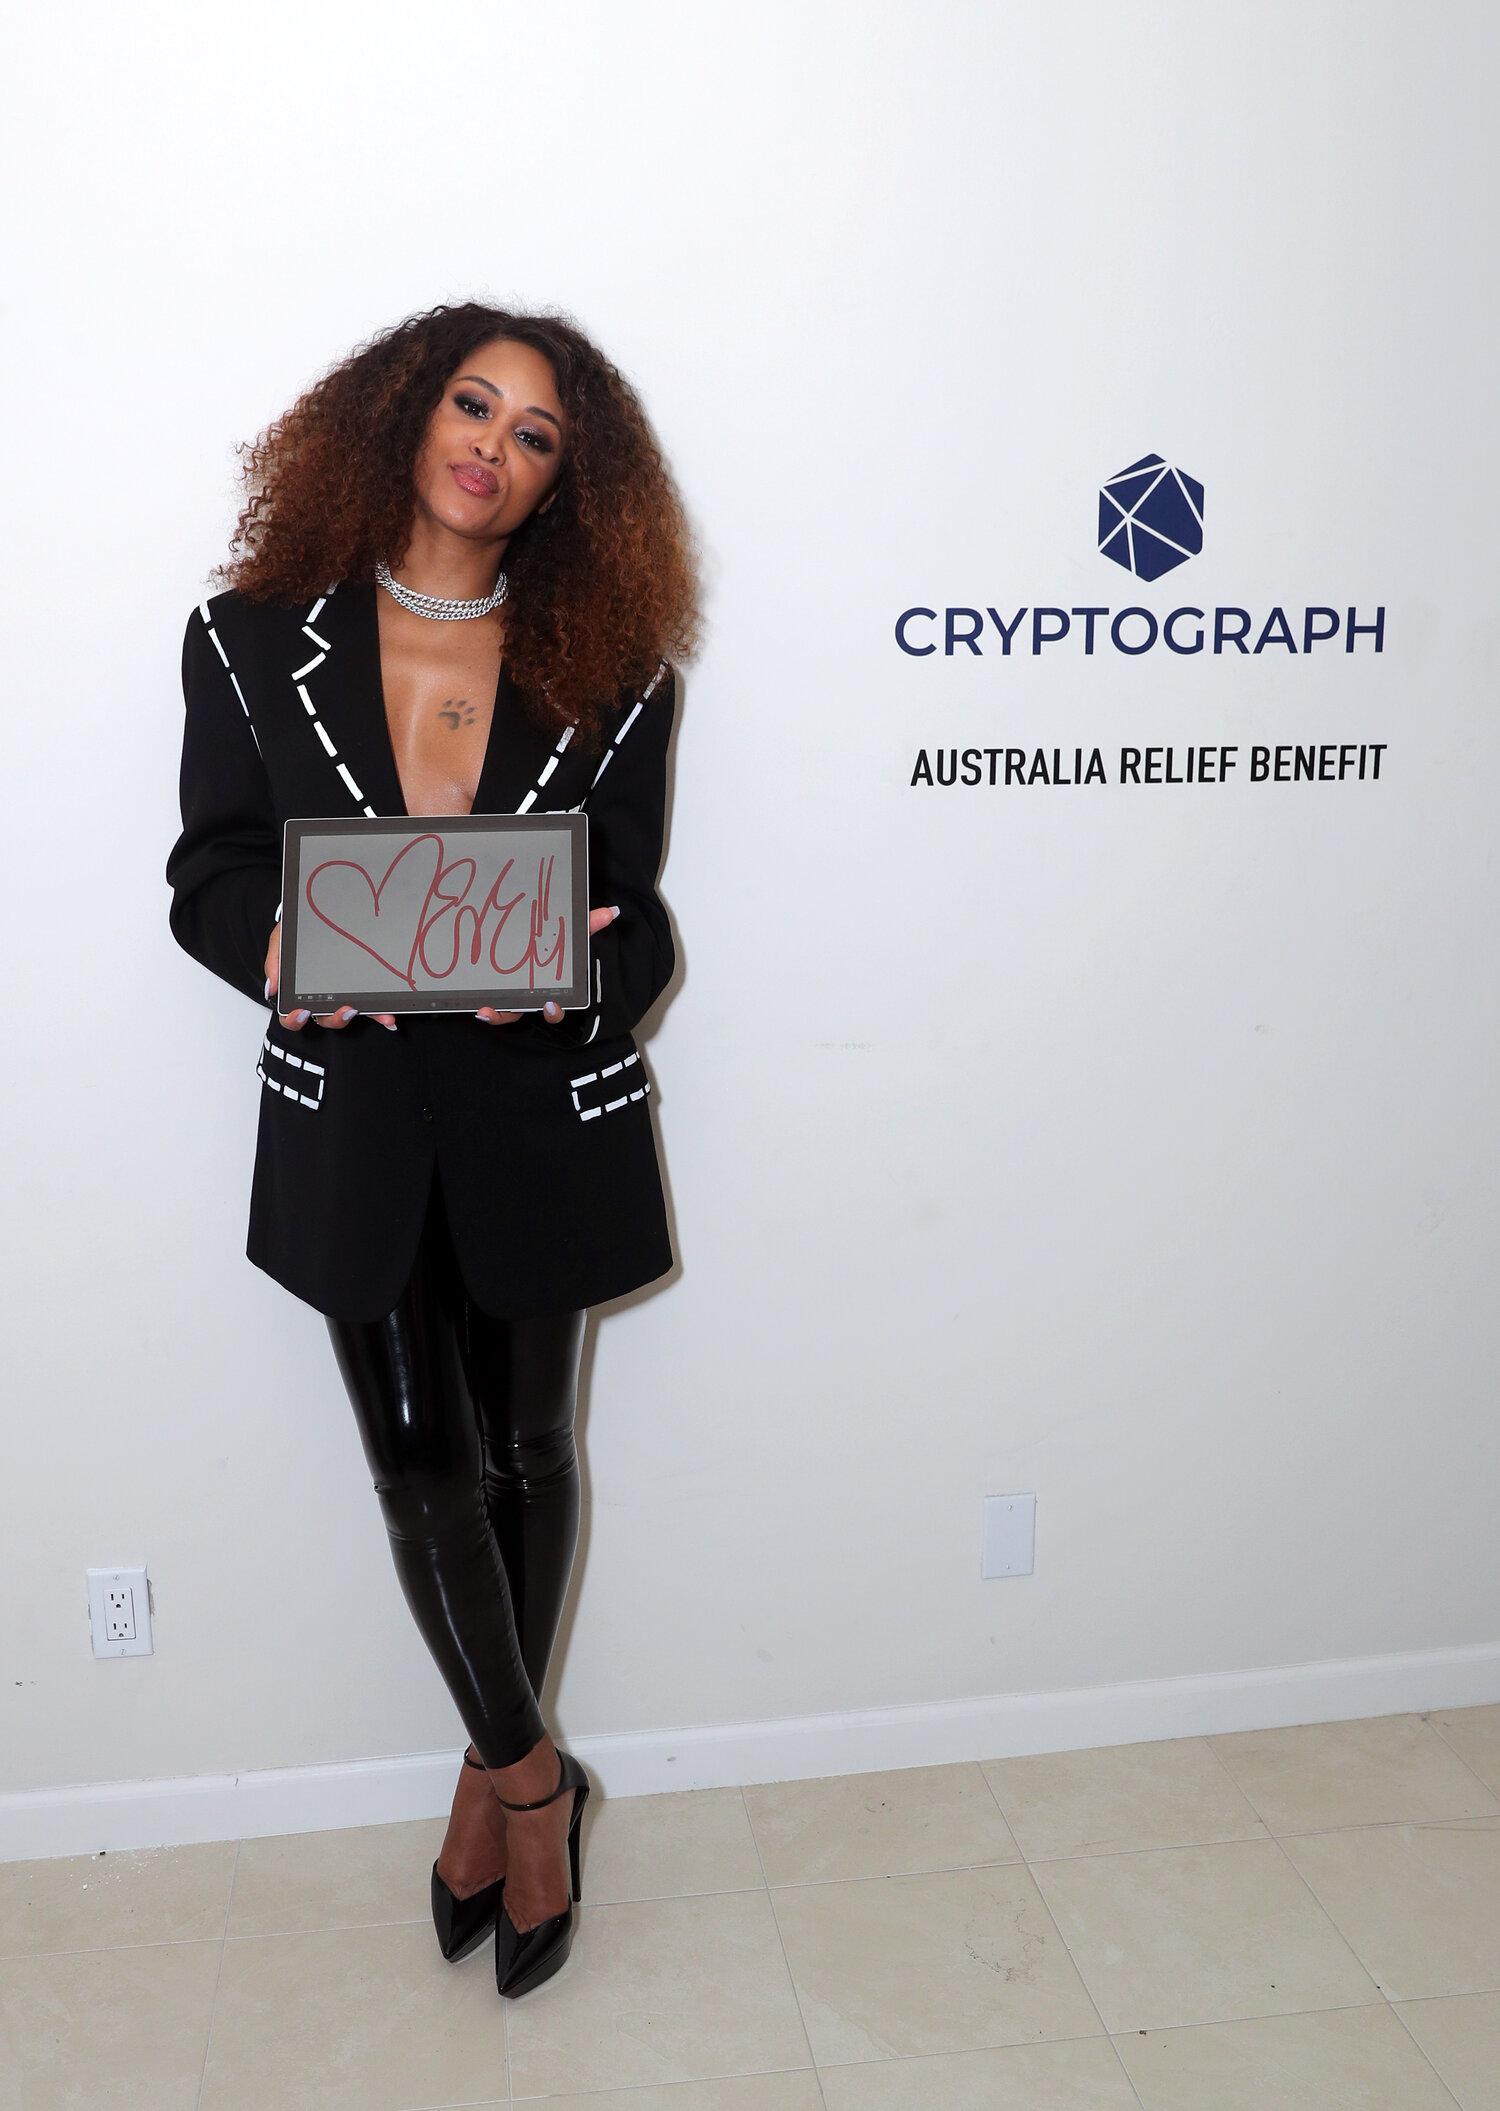 Flaunt-Eve-Cryptograph.jpg